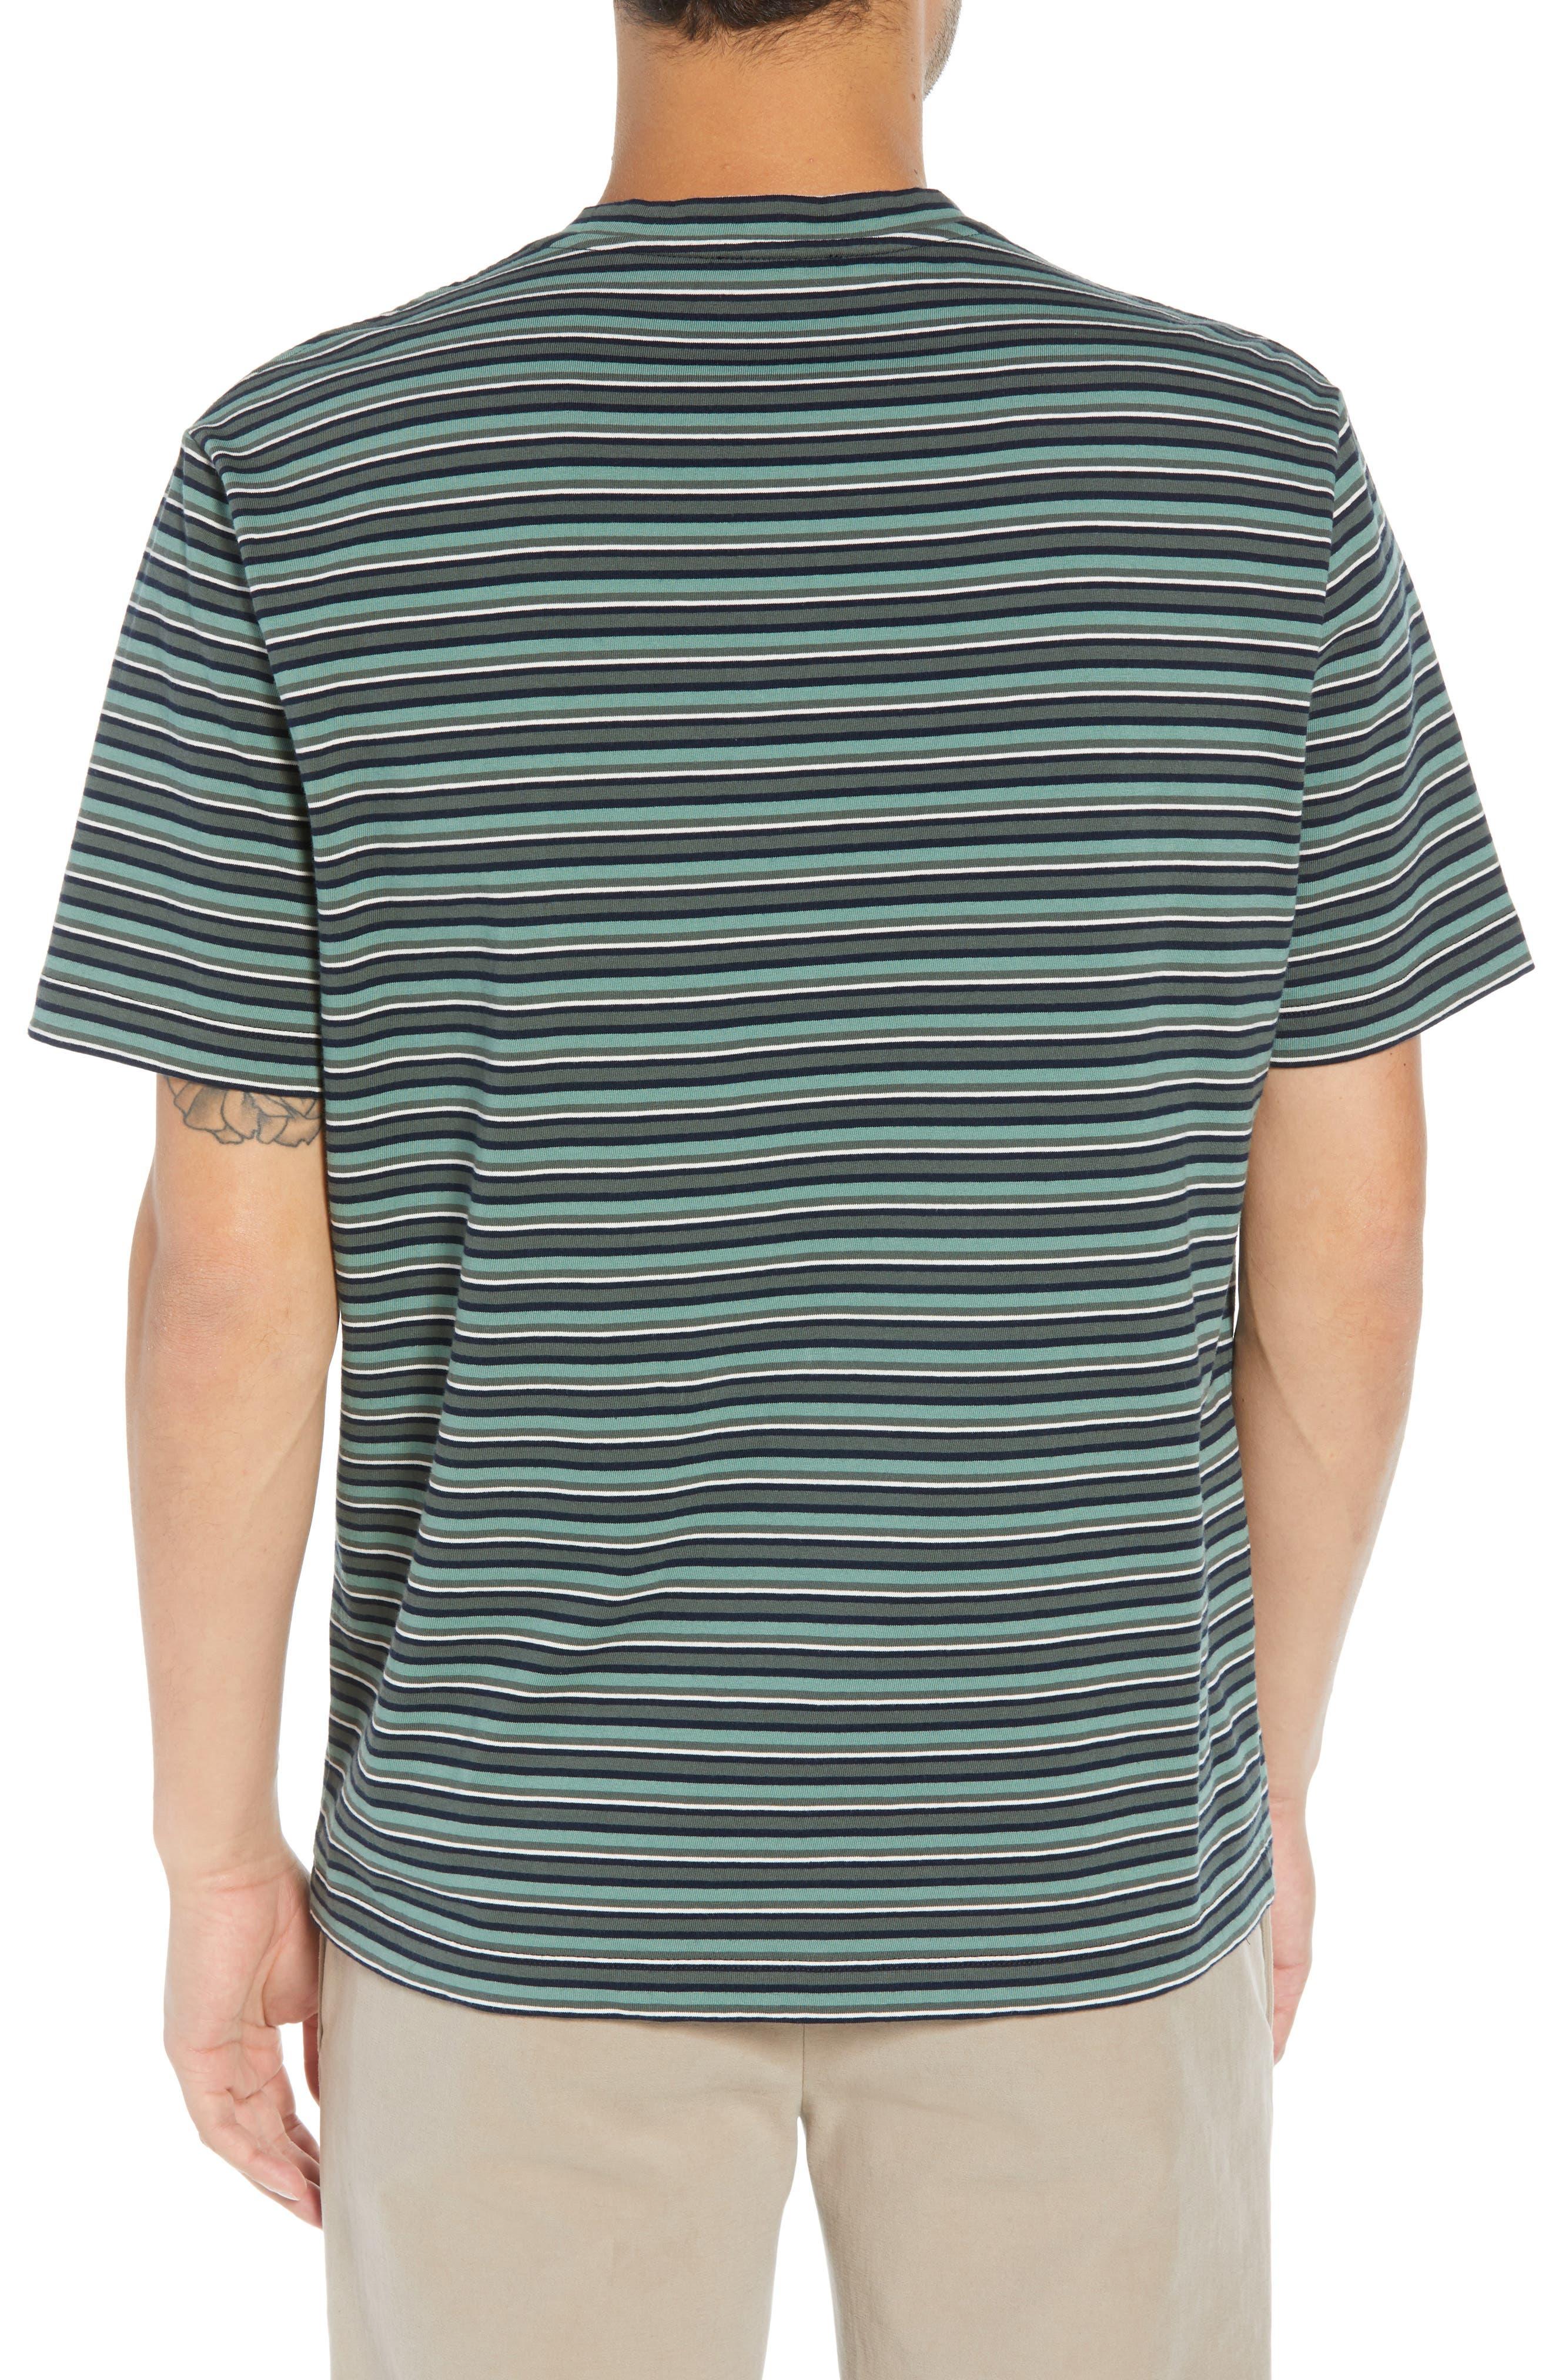 Regular Fit Multistripe Pocket T-Shirt,                             Alternate thumbnail 2, color,                             URBAN GREEN/ SPEARMINT